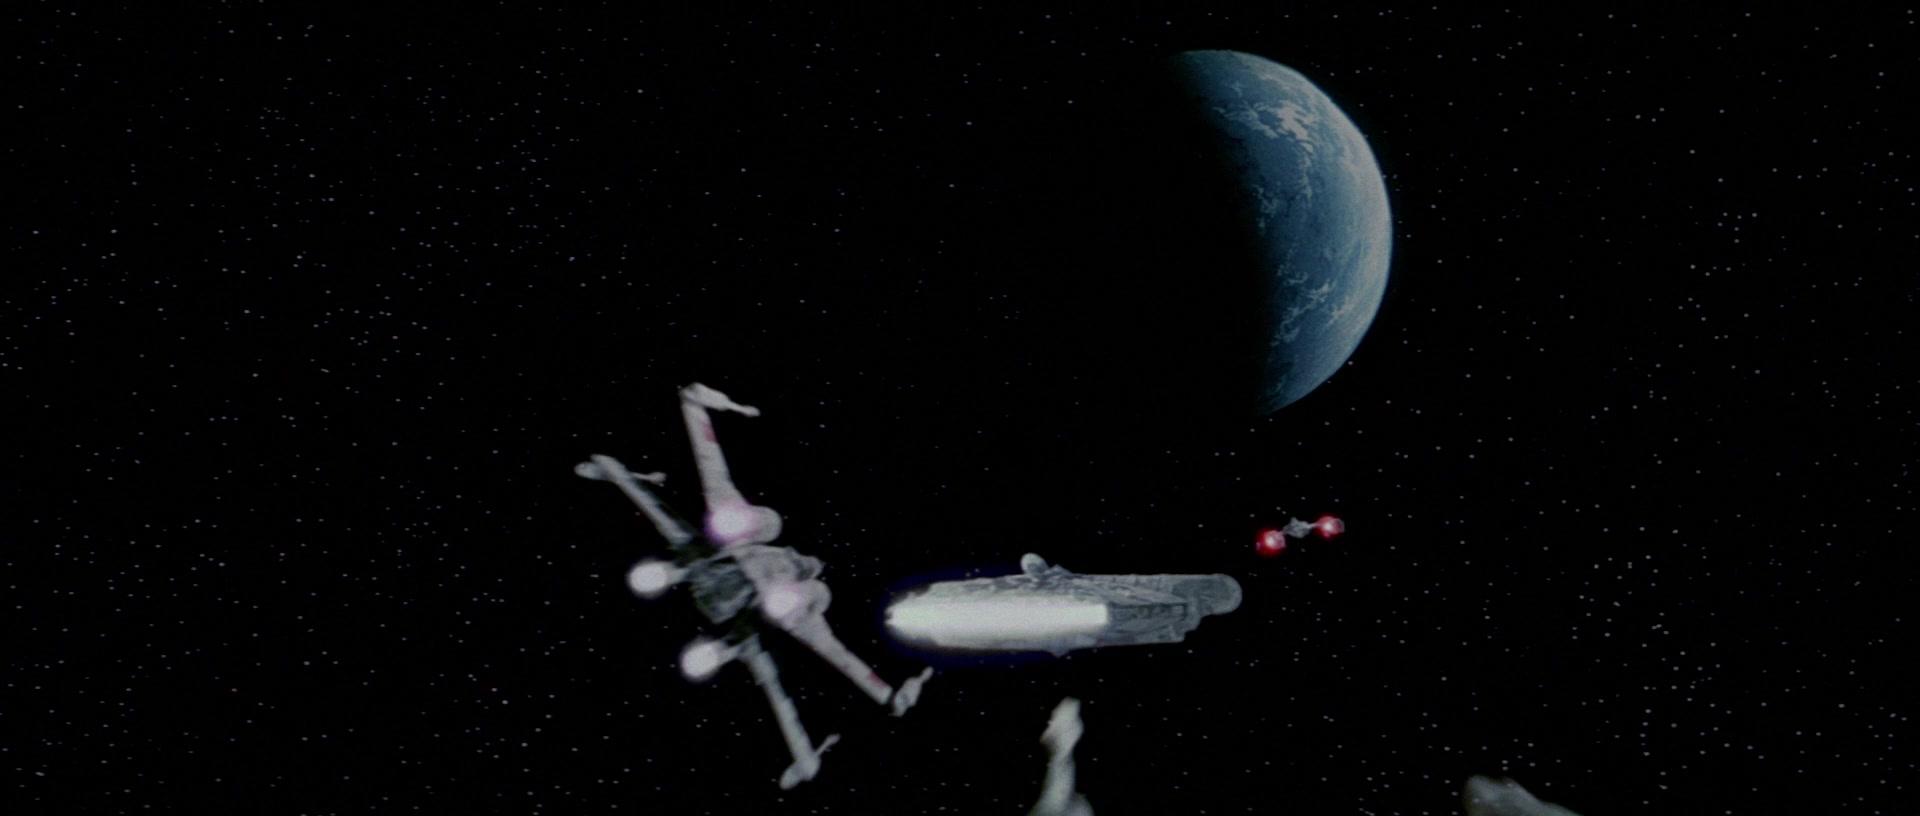 star wars a new hope batle of yavin millennium falcn evaan verlaine wedge antilles